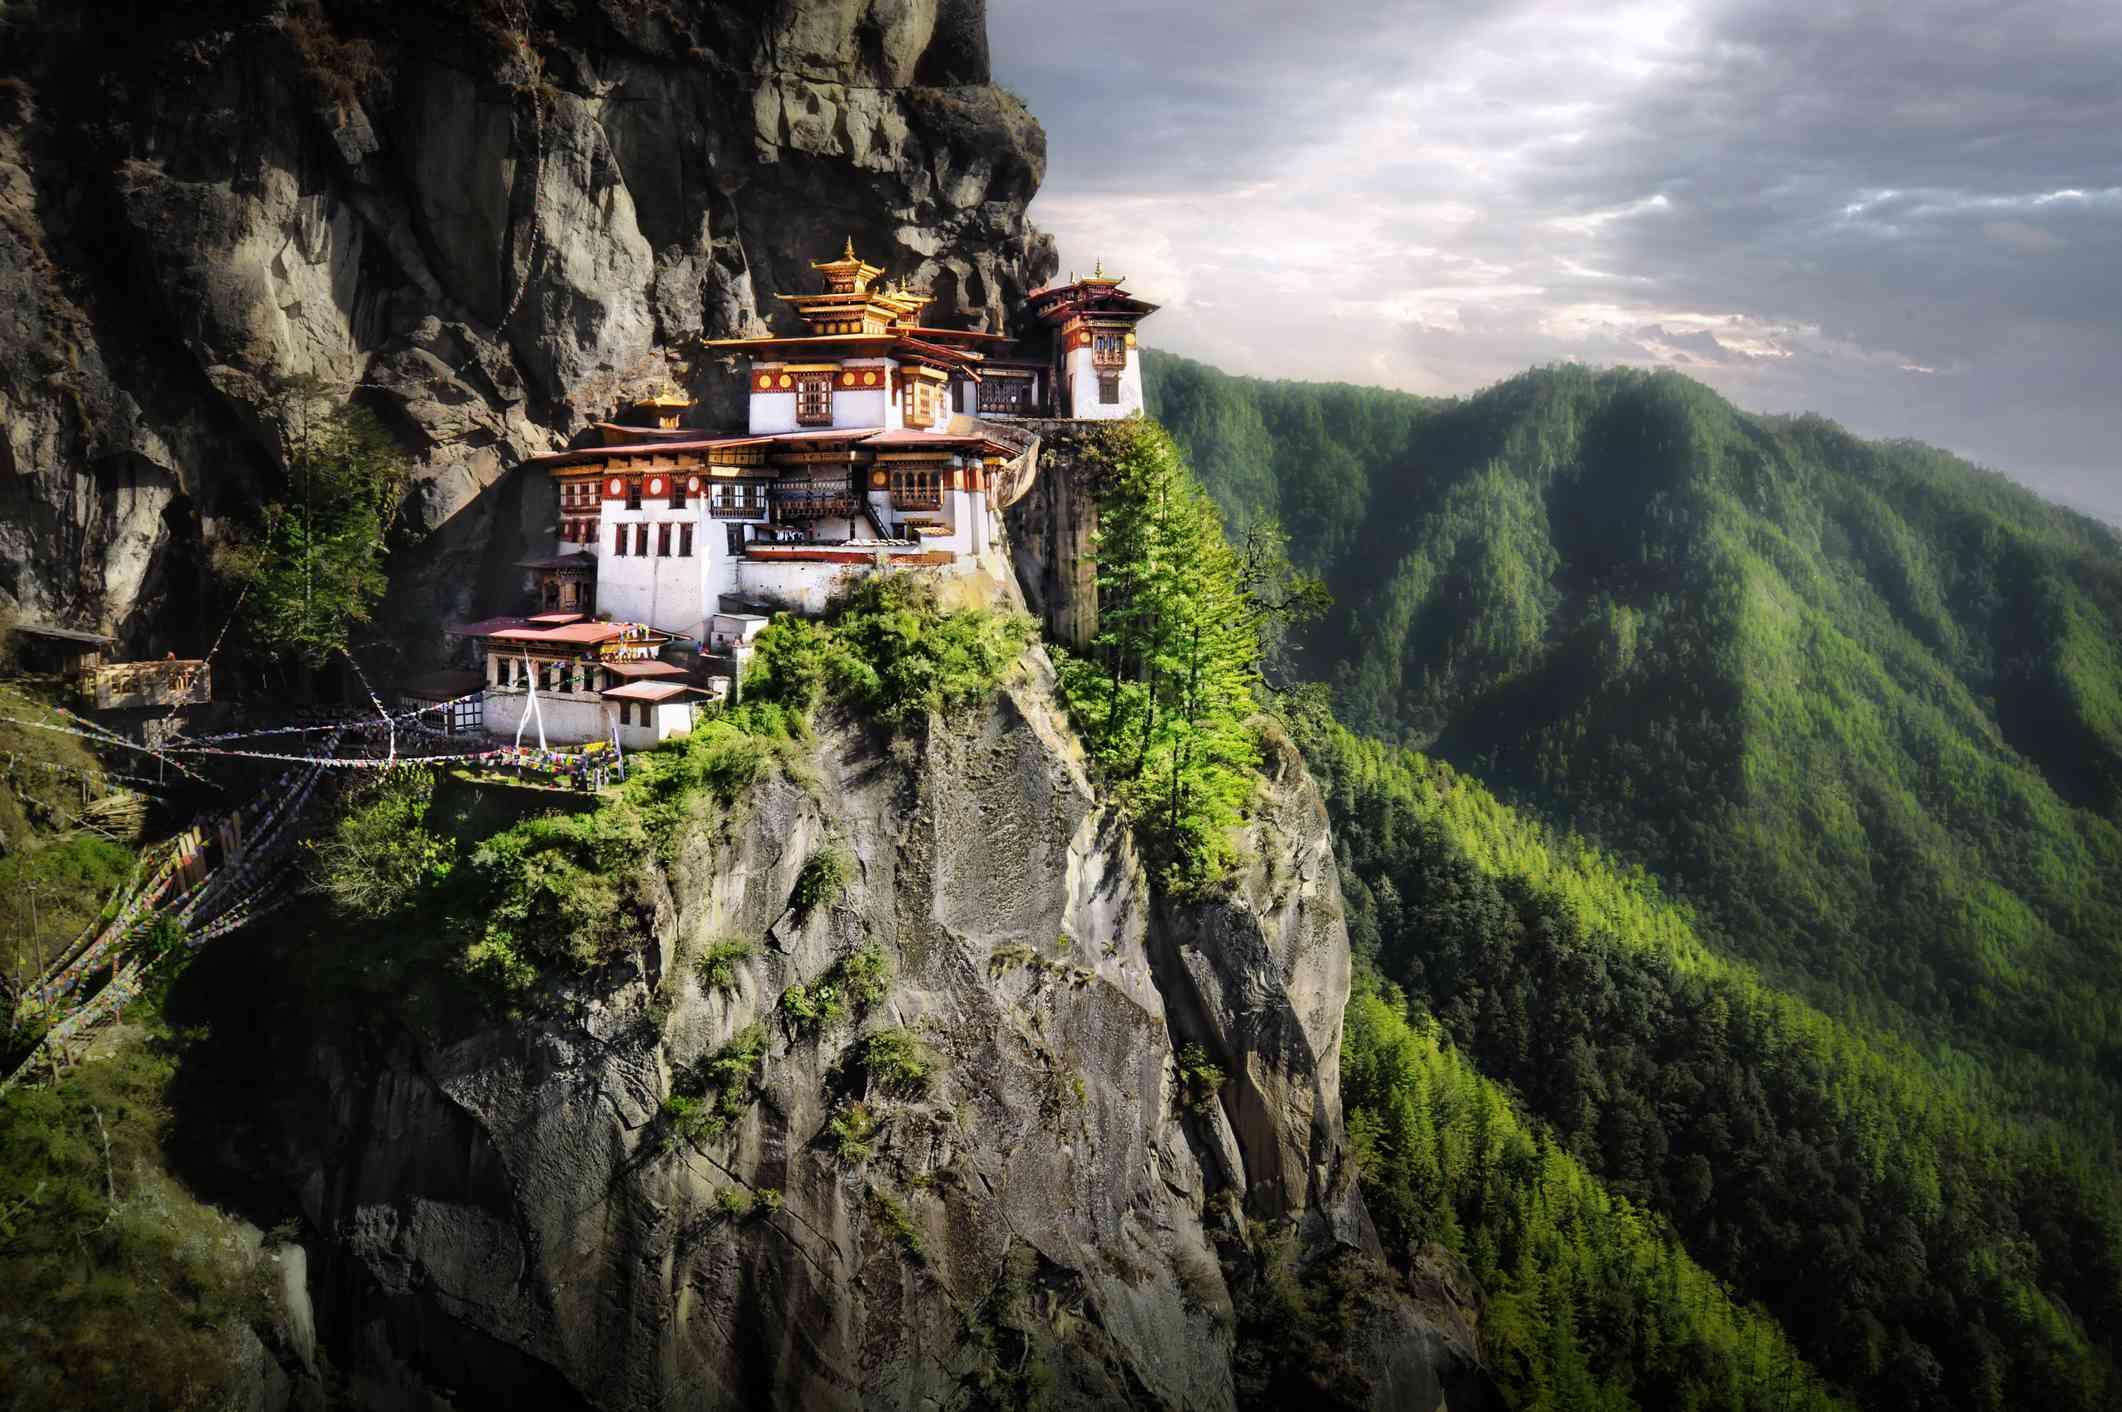 Monastery in the Himalayan Mountains of Bhutan